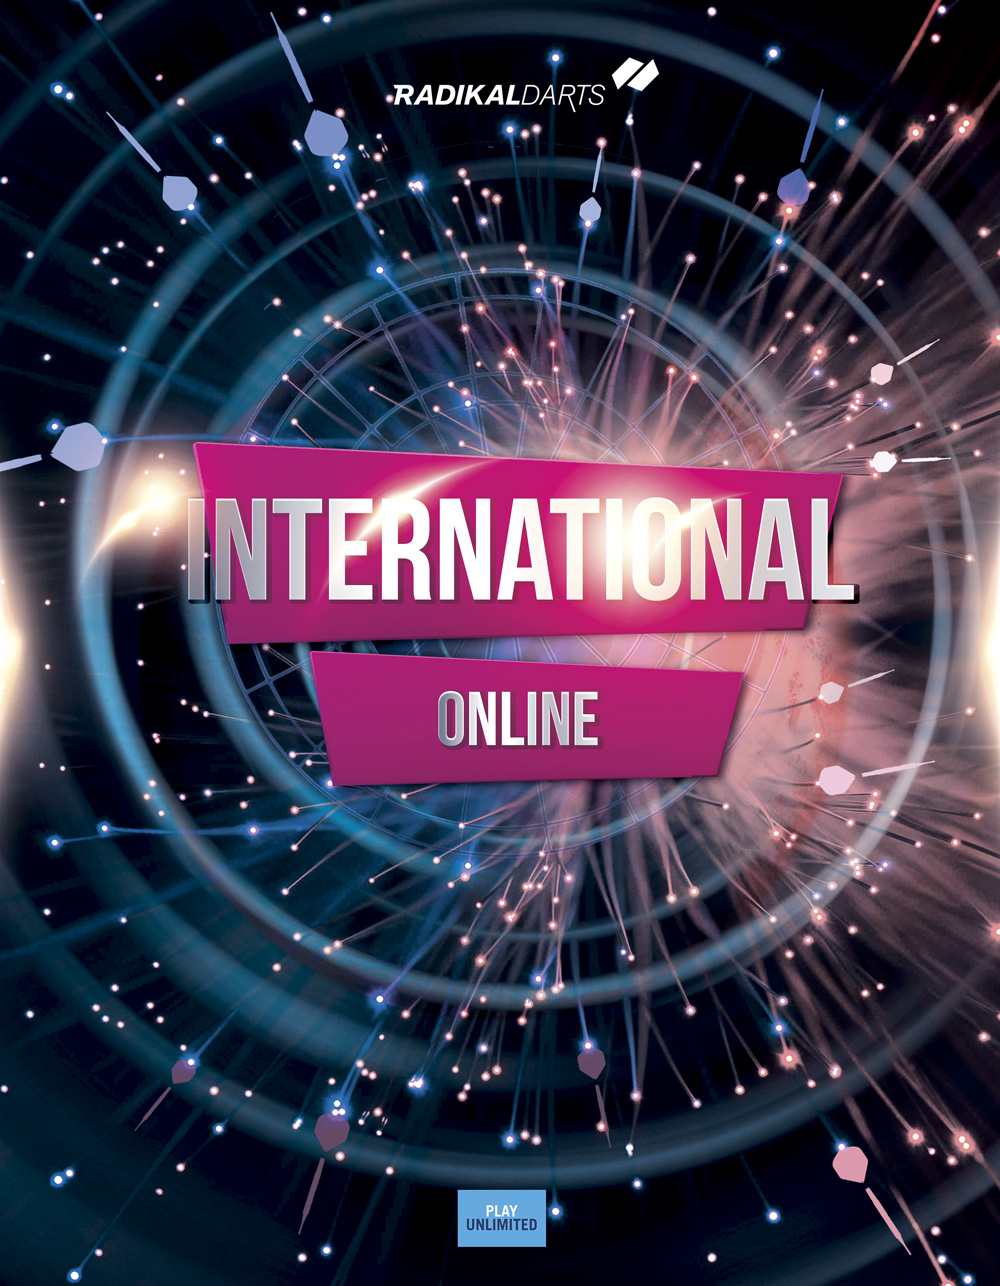 Internacional Online Radikal Darts